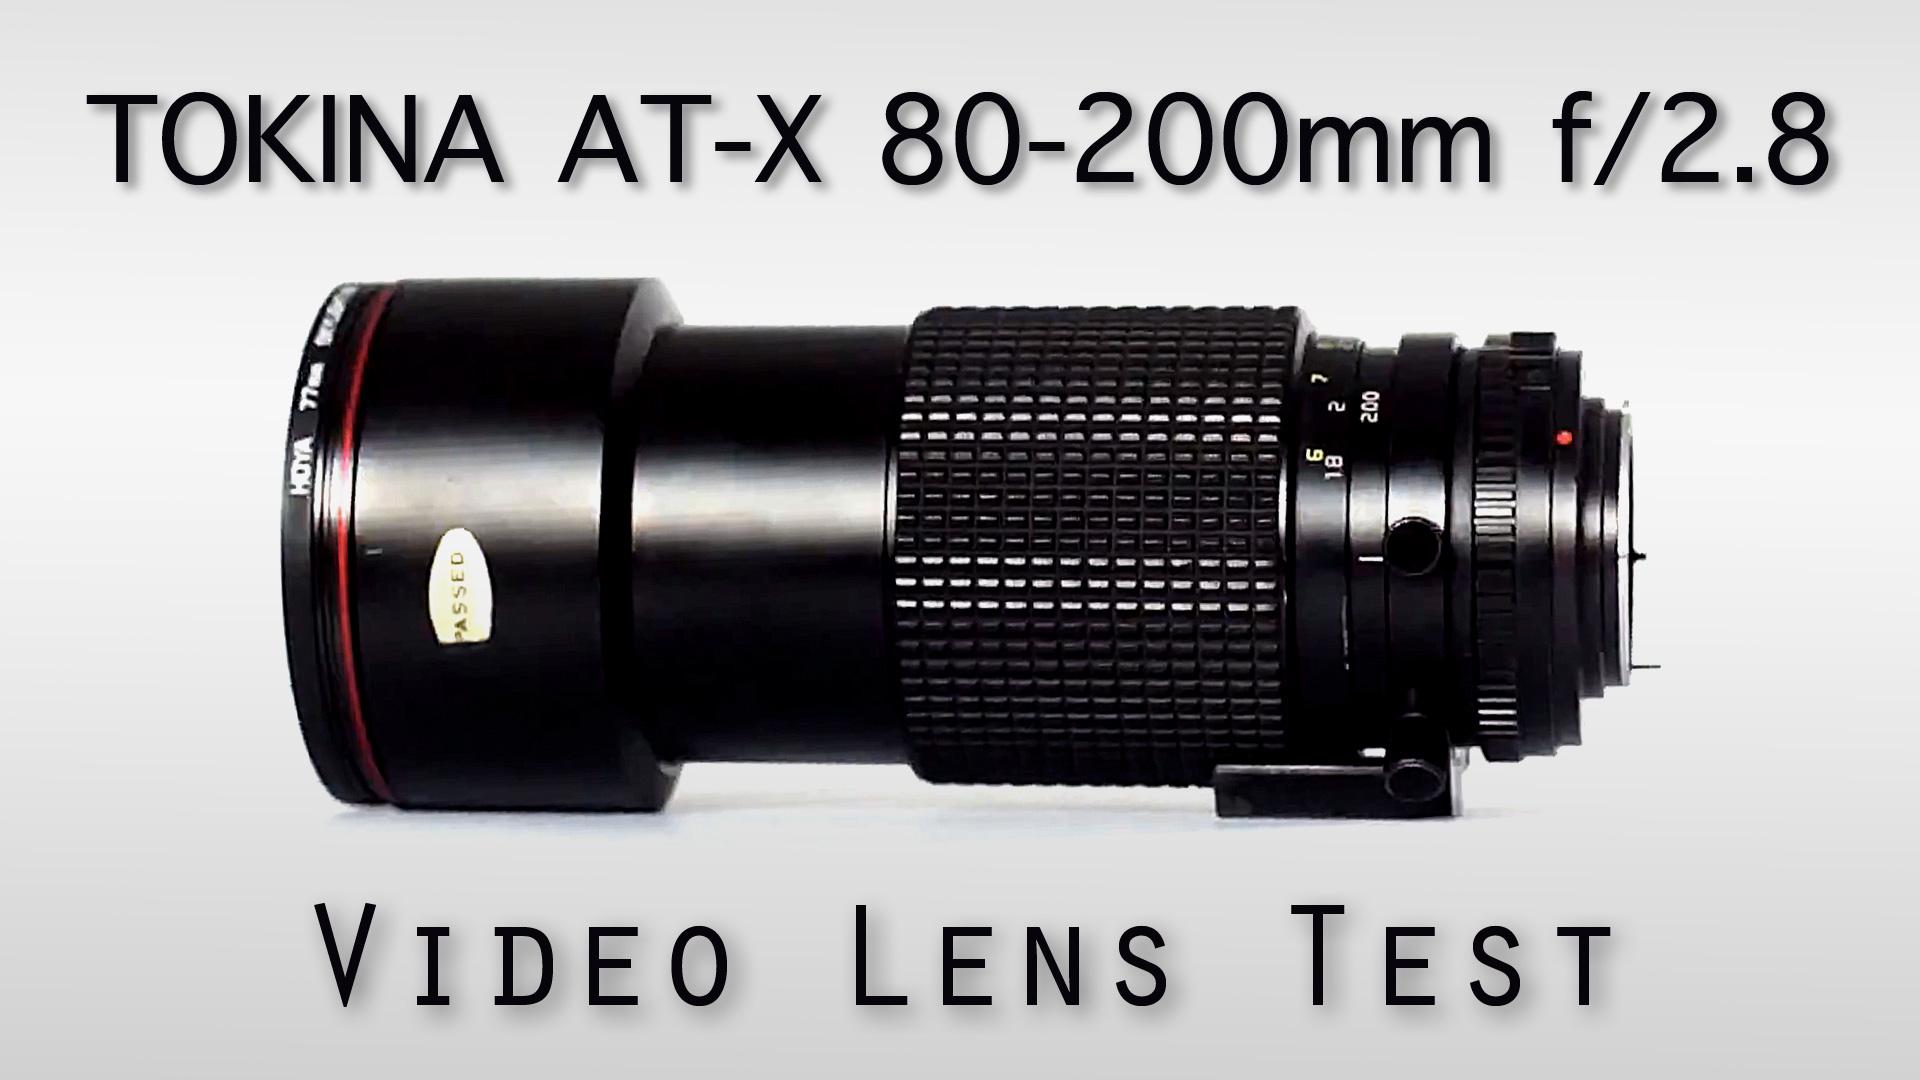 TOKINA AT-X 80-200mm f/2.8 LENS TEST